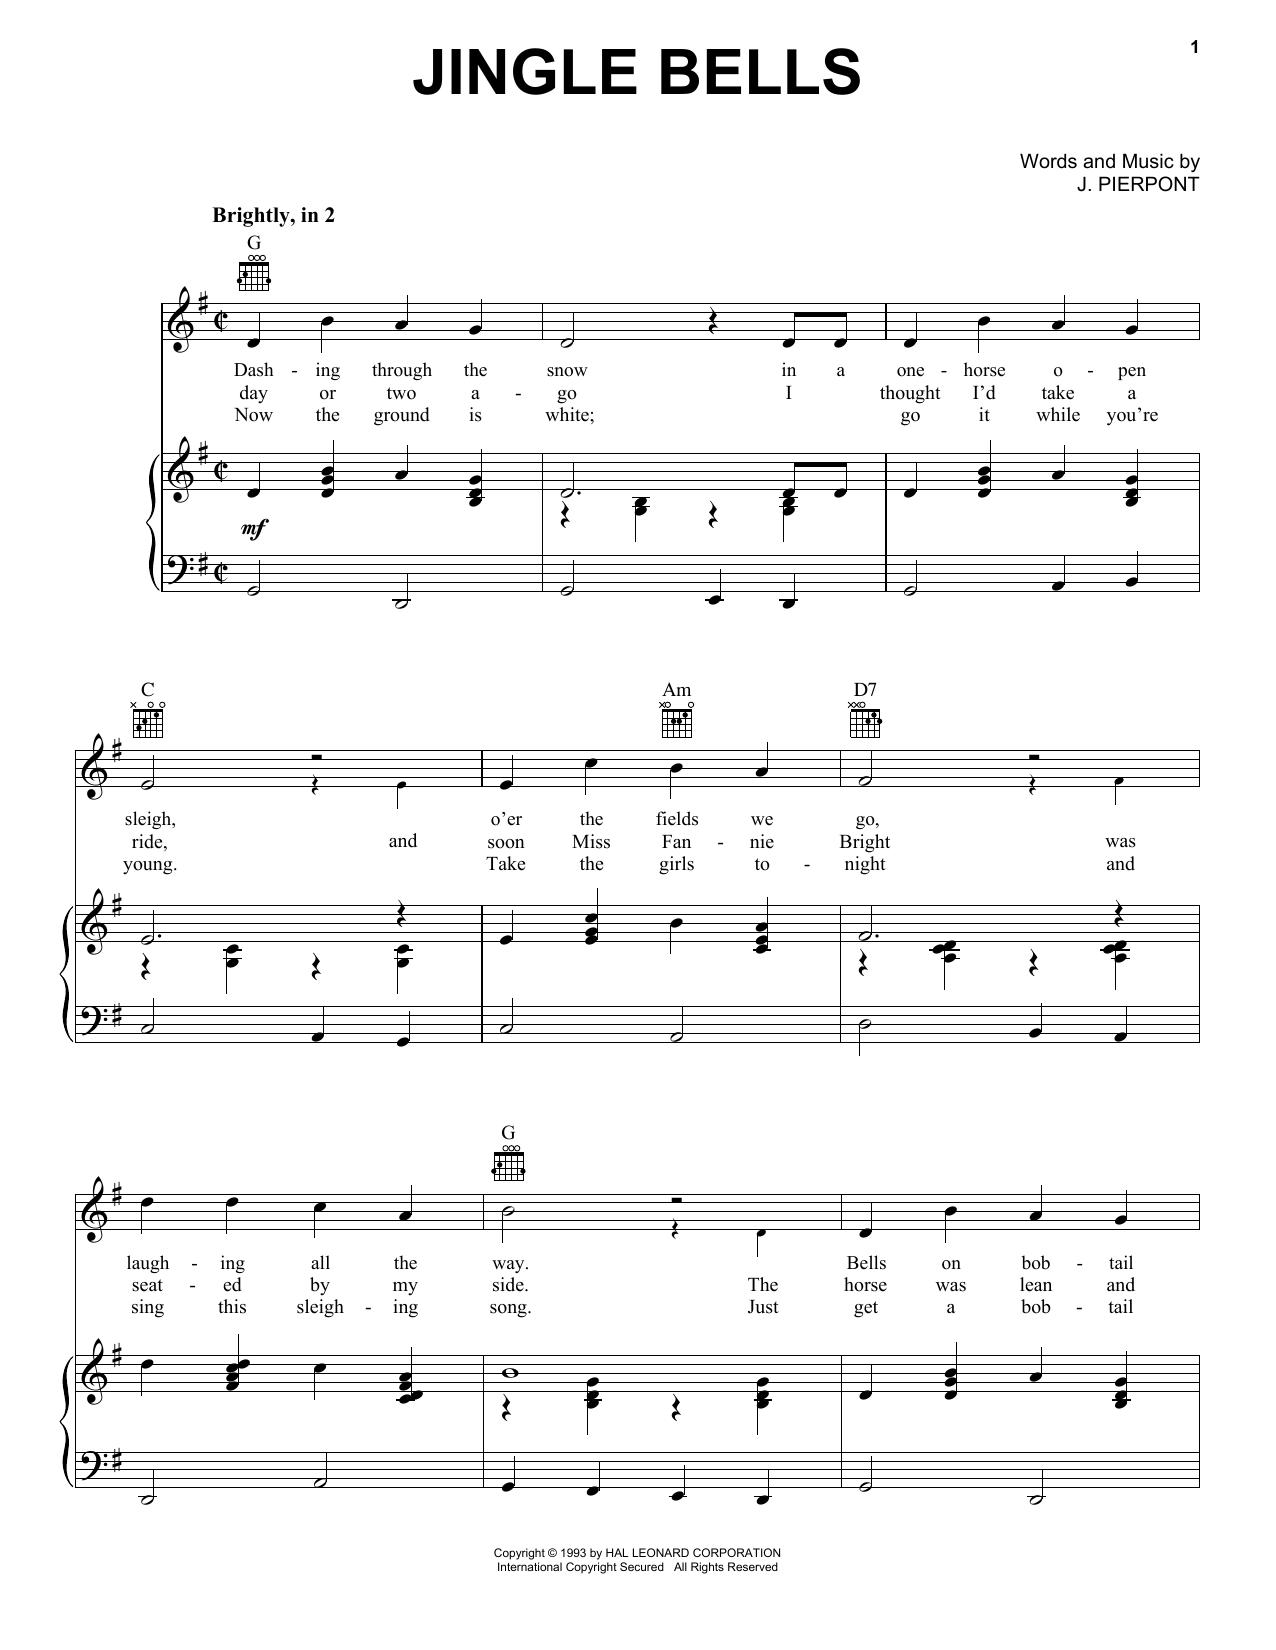 J. Pierpont Jingle Bells sheet music notes and chords - download printable PDF.